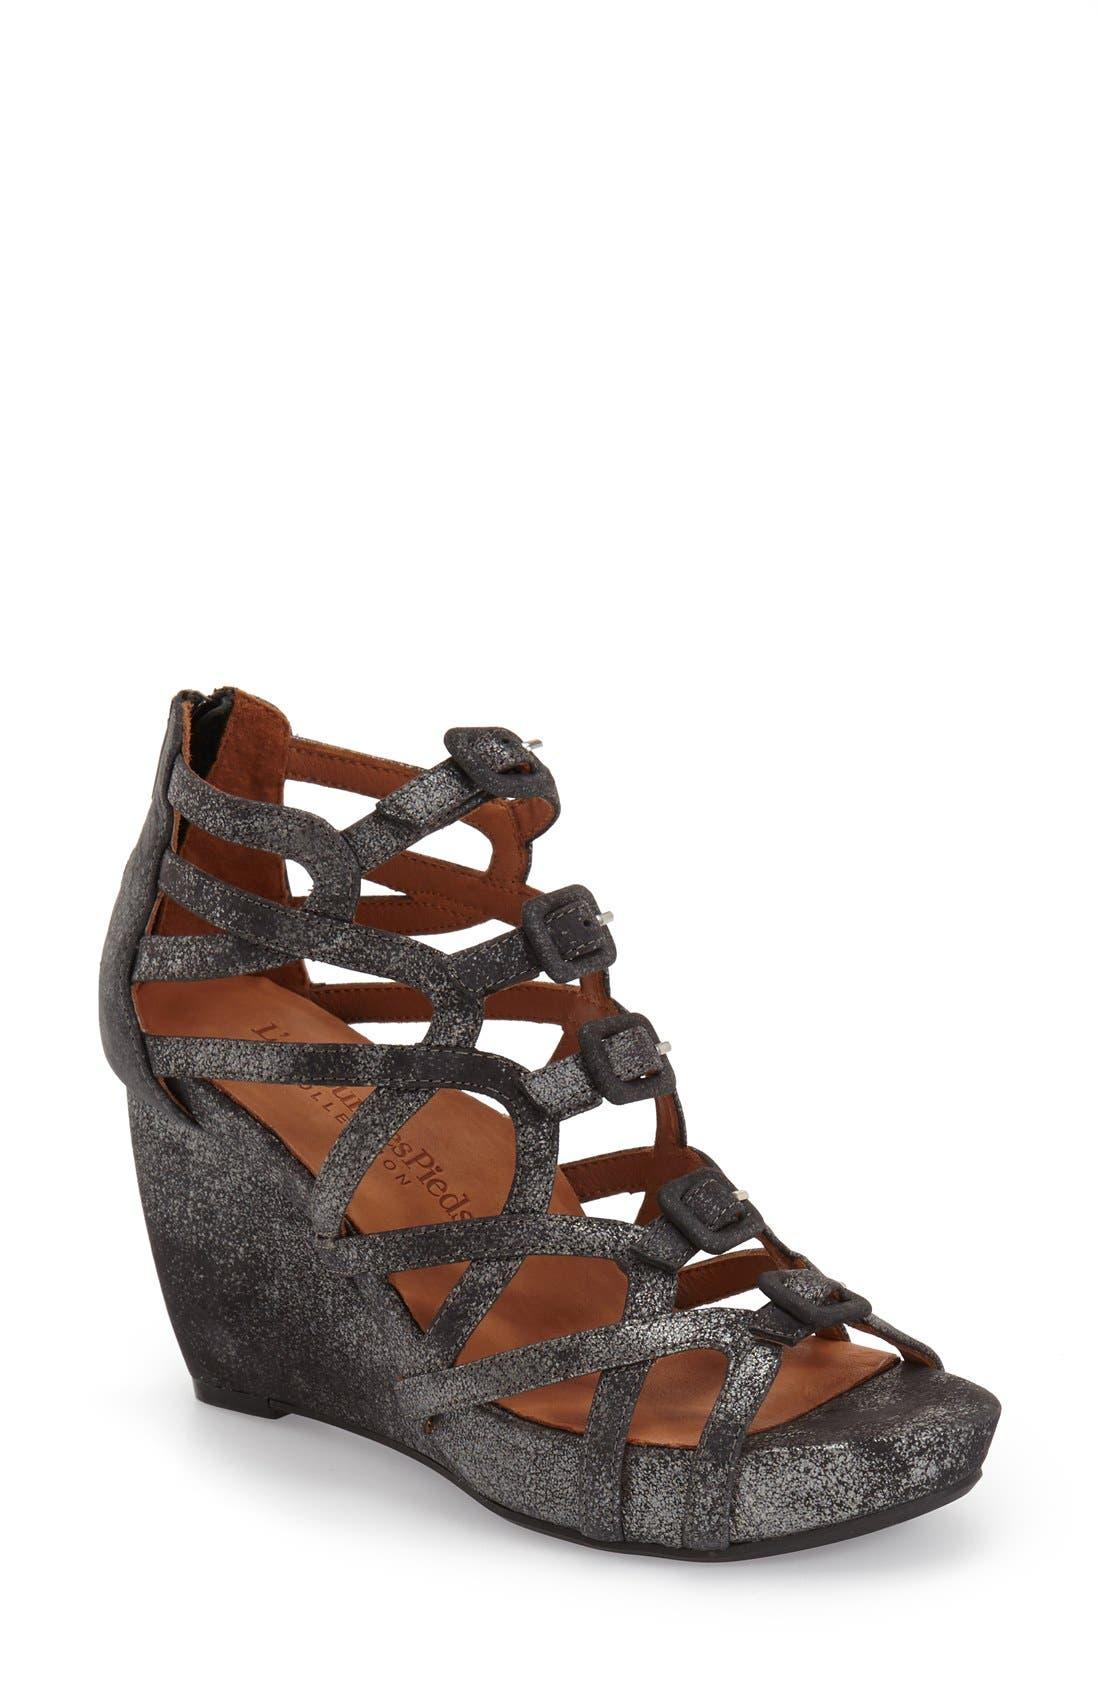 L'AMOUR DES PIEDS Ivanna' Gladiator Wedge Sandal